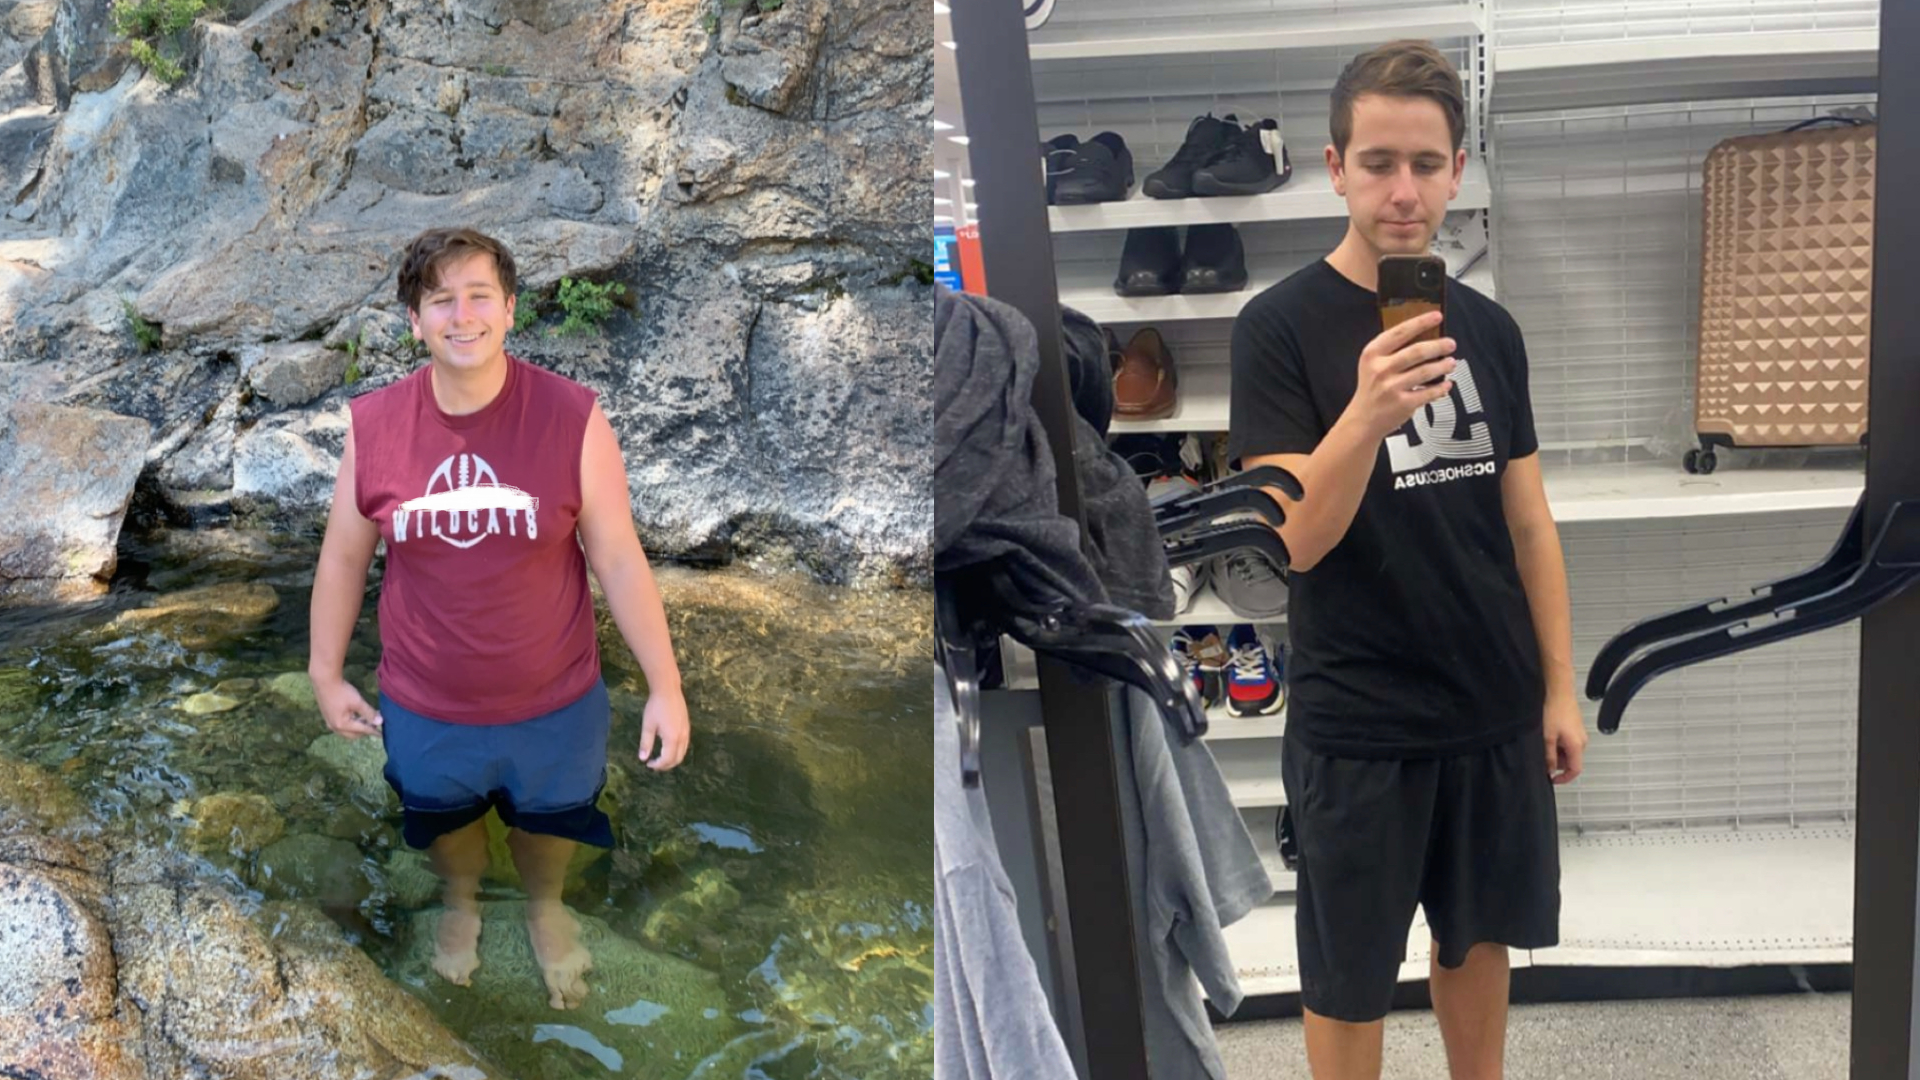 Progress Pics of 70 lbs Weight Loss 5 foot 10 Male 248 lbs to 178 lbs